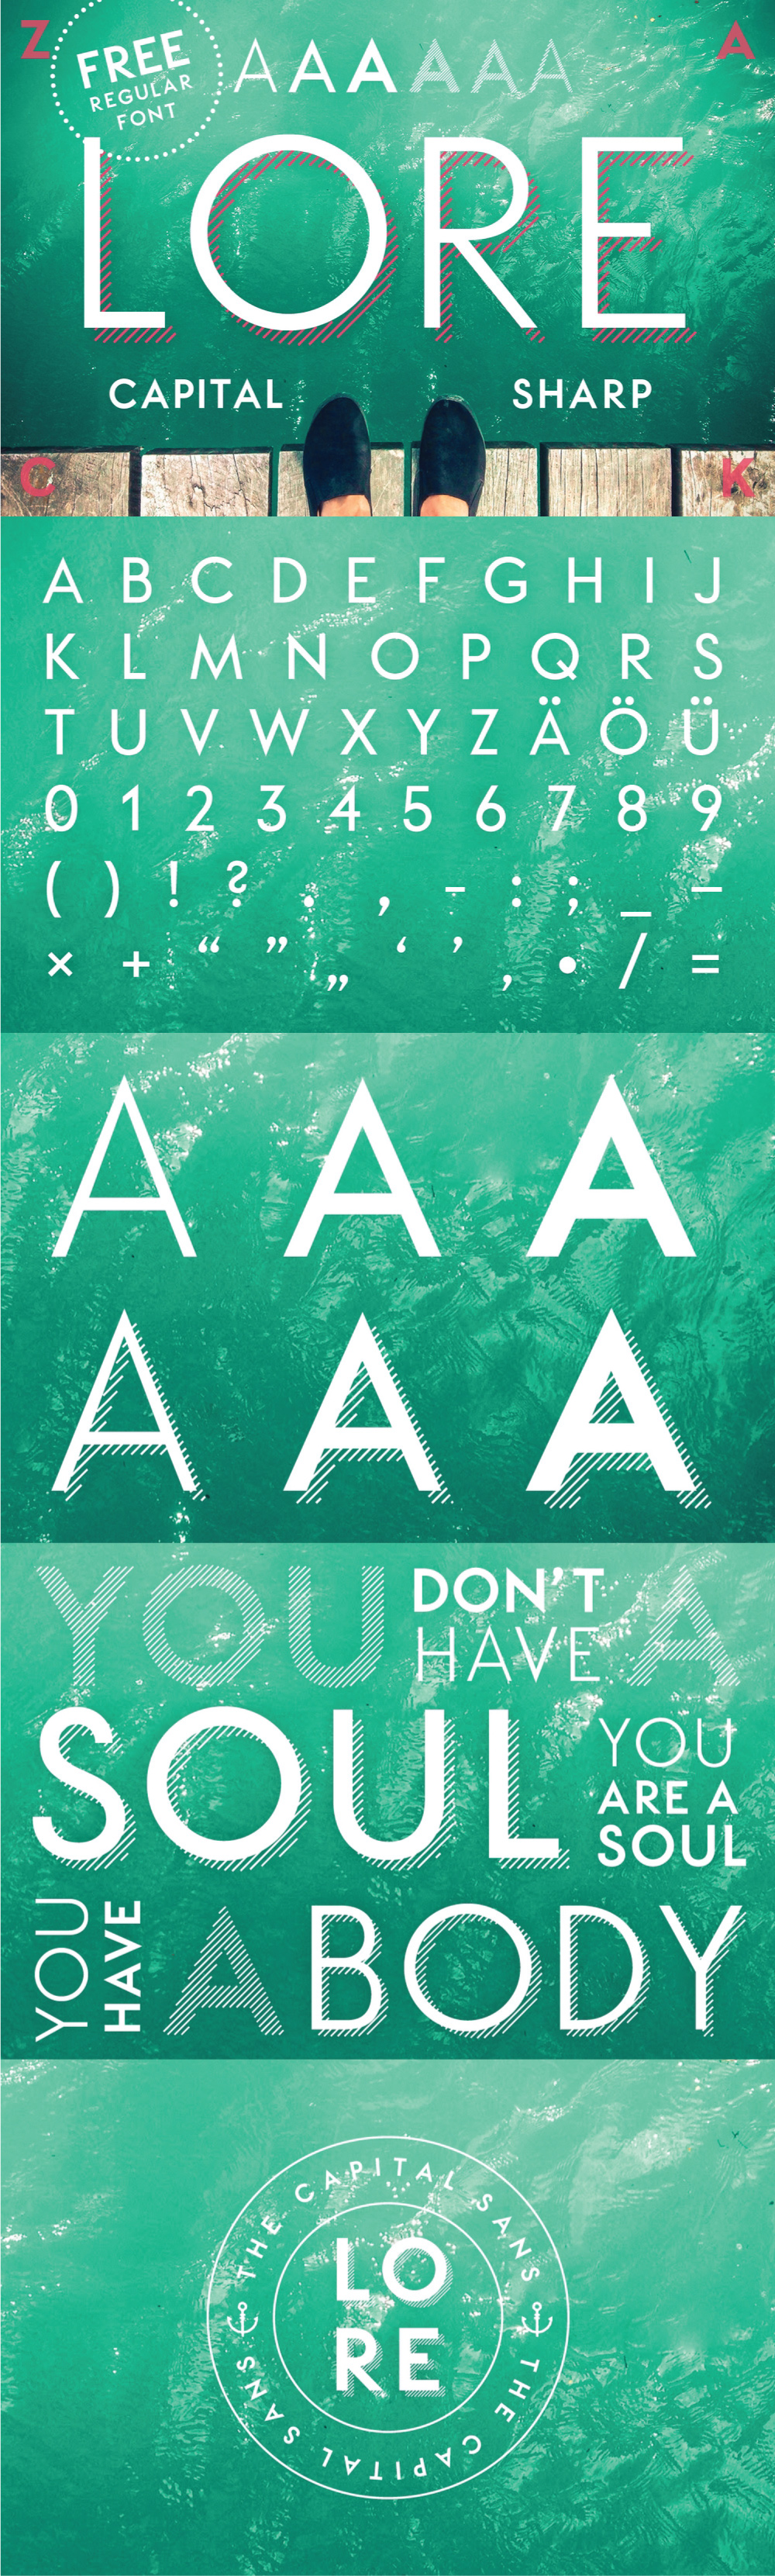 Free font free fonts free freebie Typeface free typeface geometric sans serif type commercial use